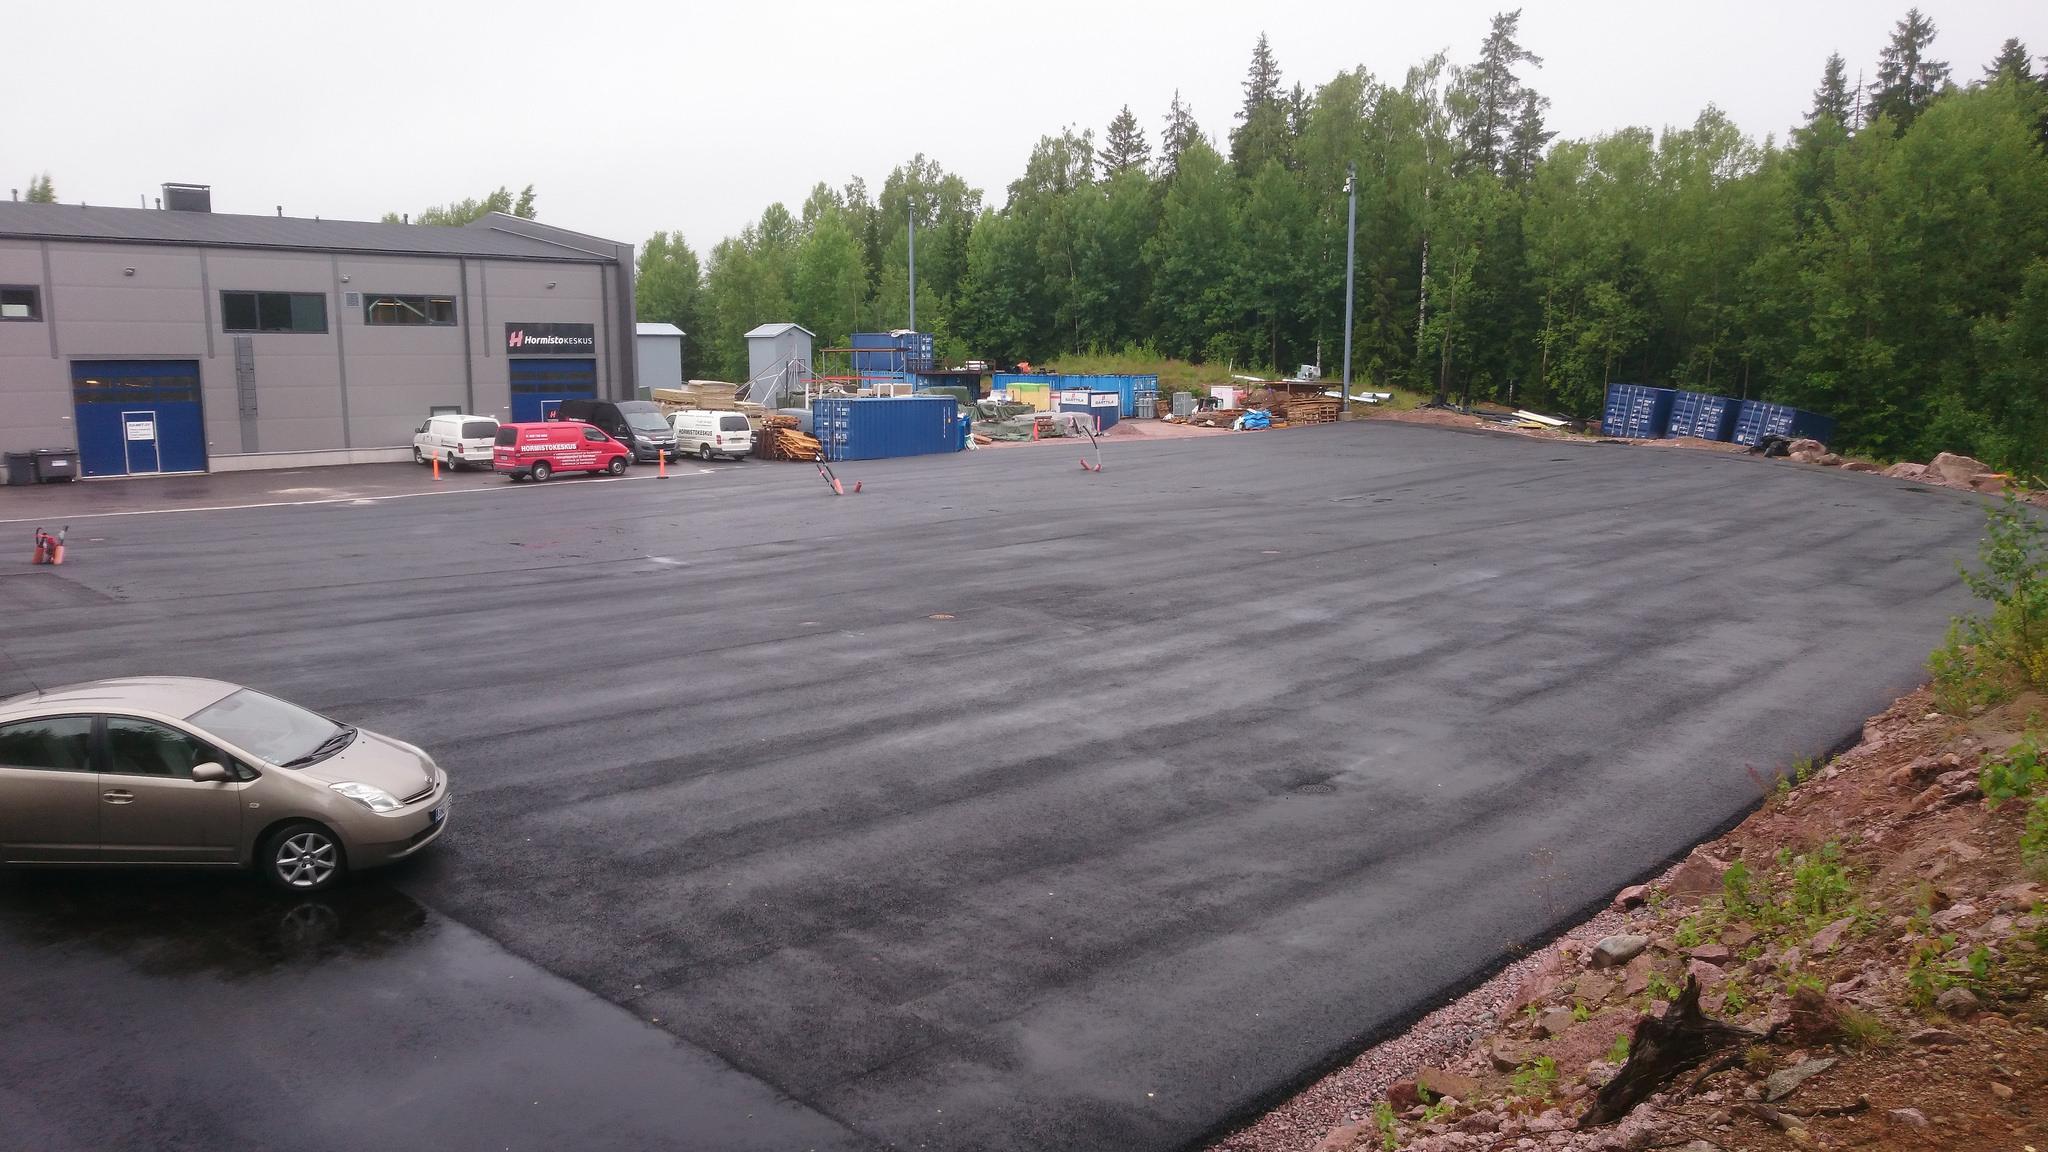 Juvanmalmin asfaltoitu piha-alue vuokrattavana